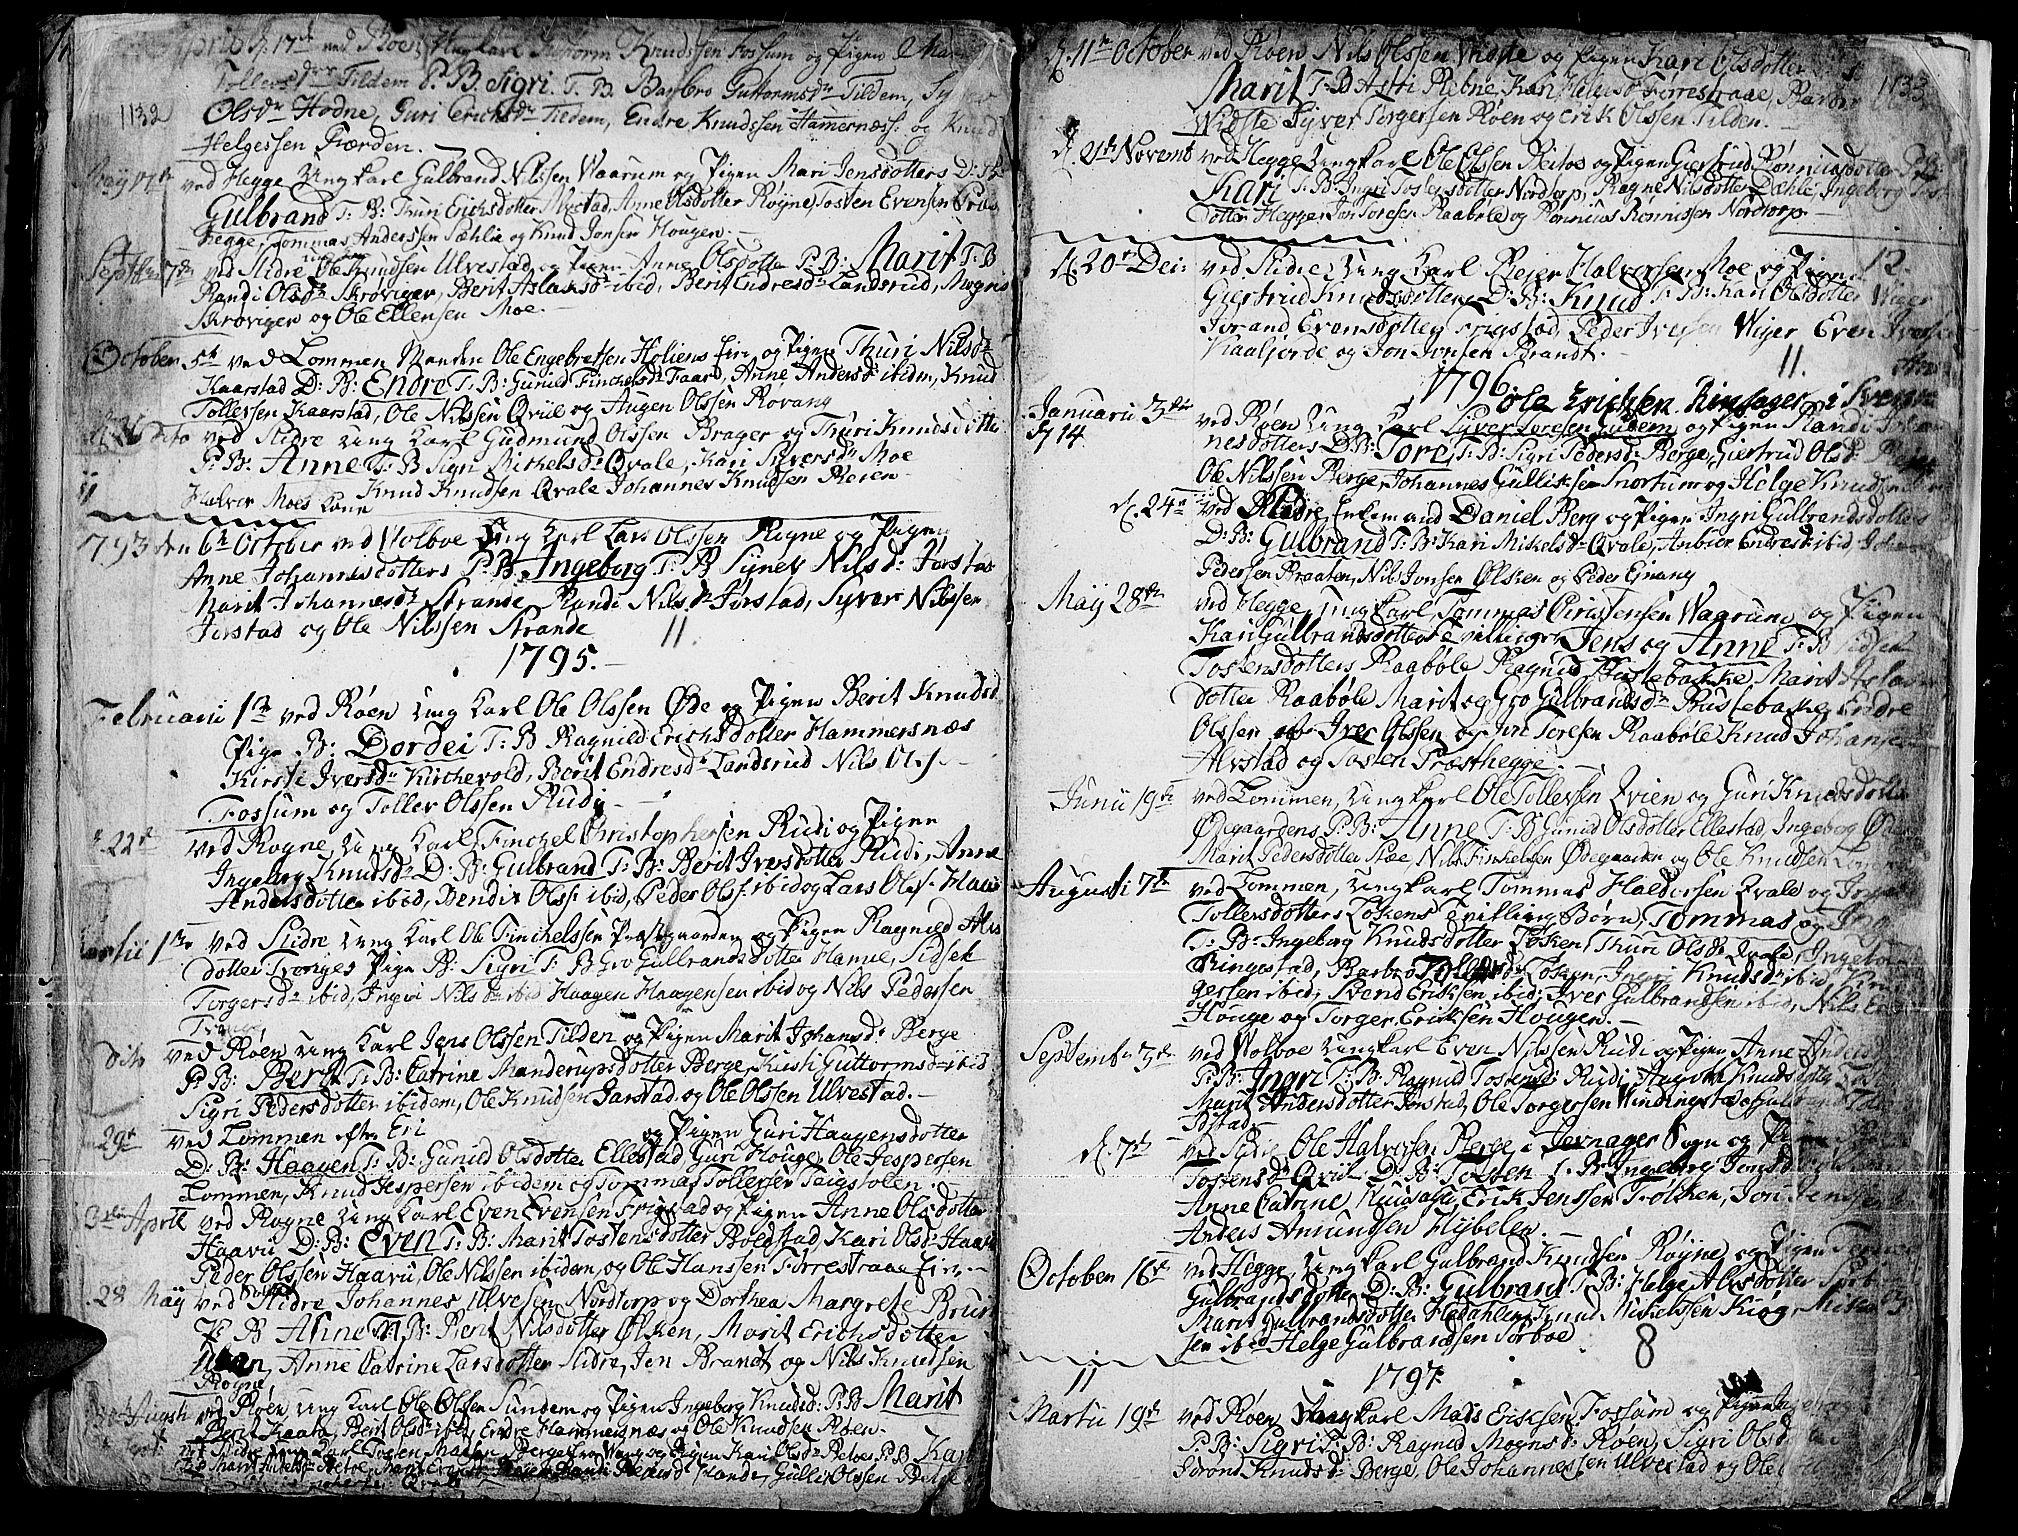 SAH, Slidre prestekontor, Parish register (official) no. 1, 1724-1814, p. 1132-1133